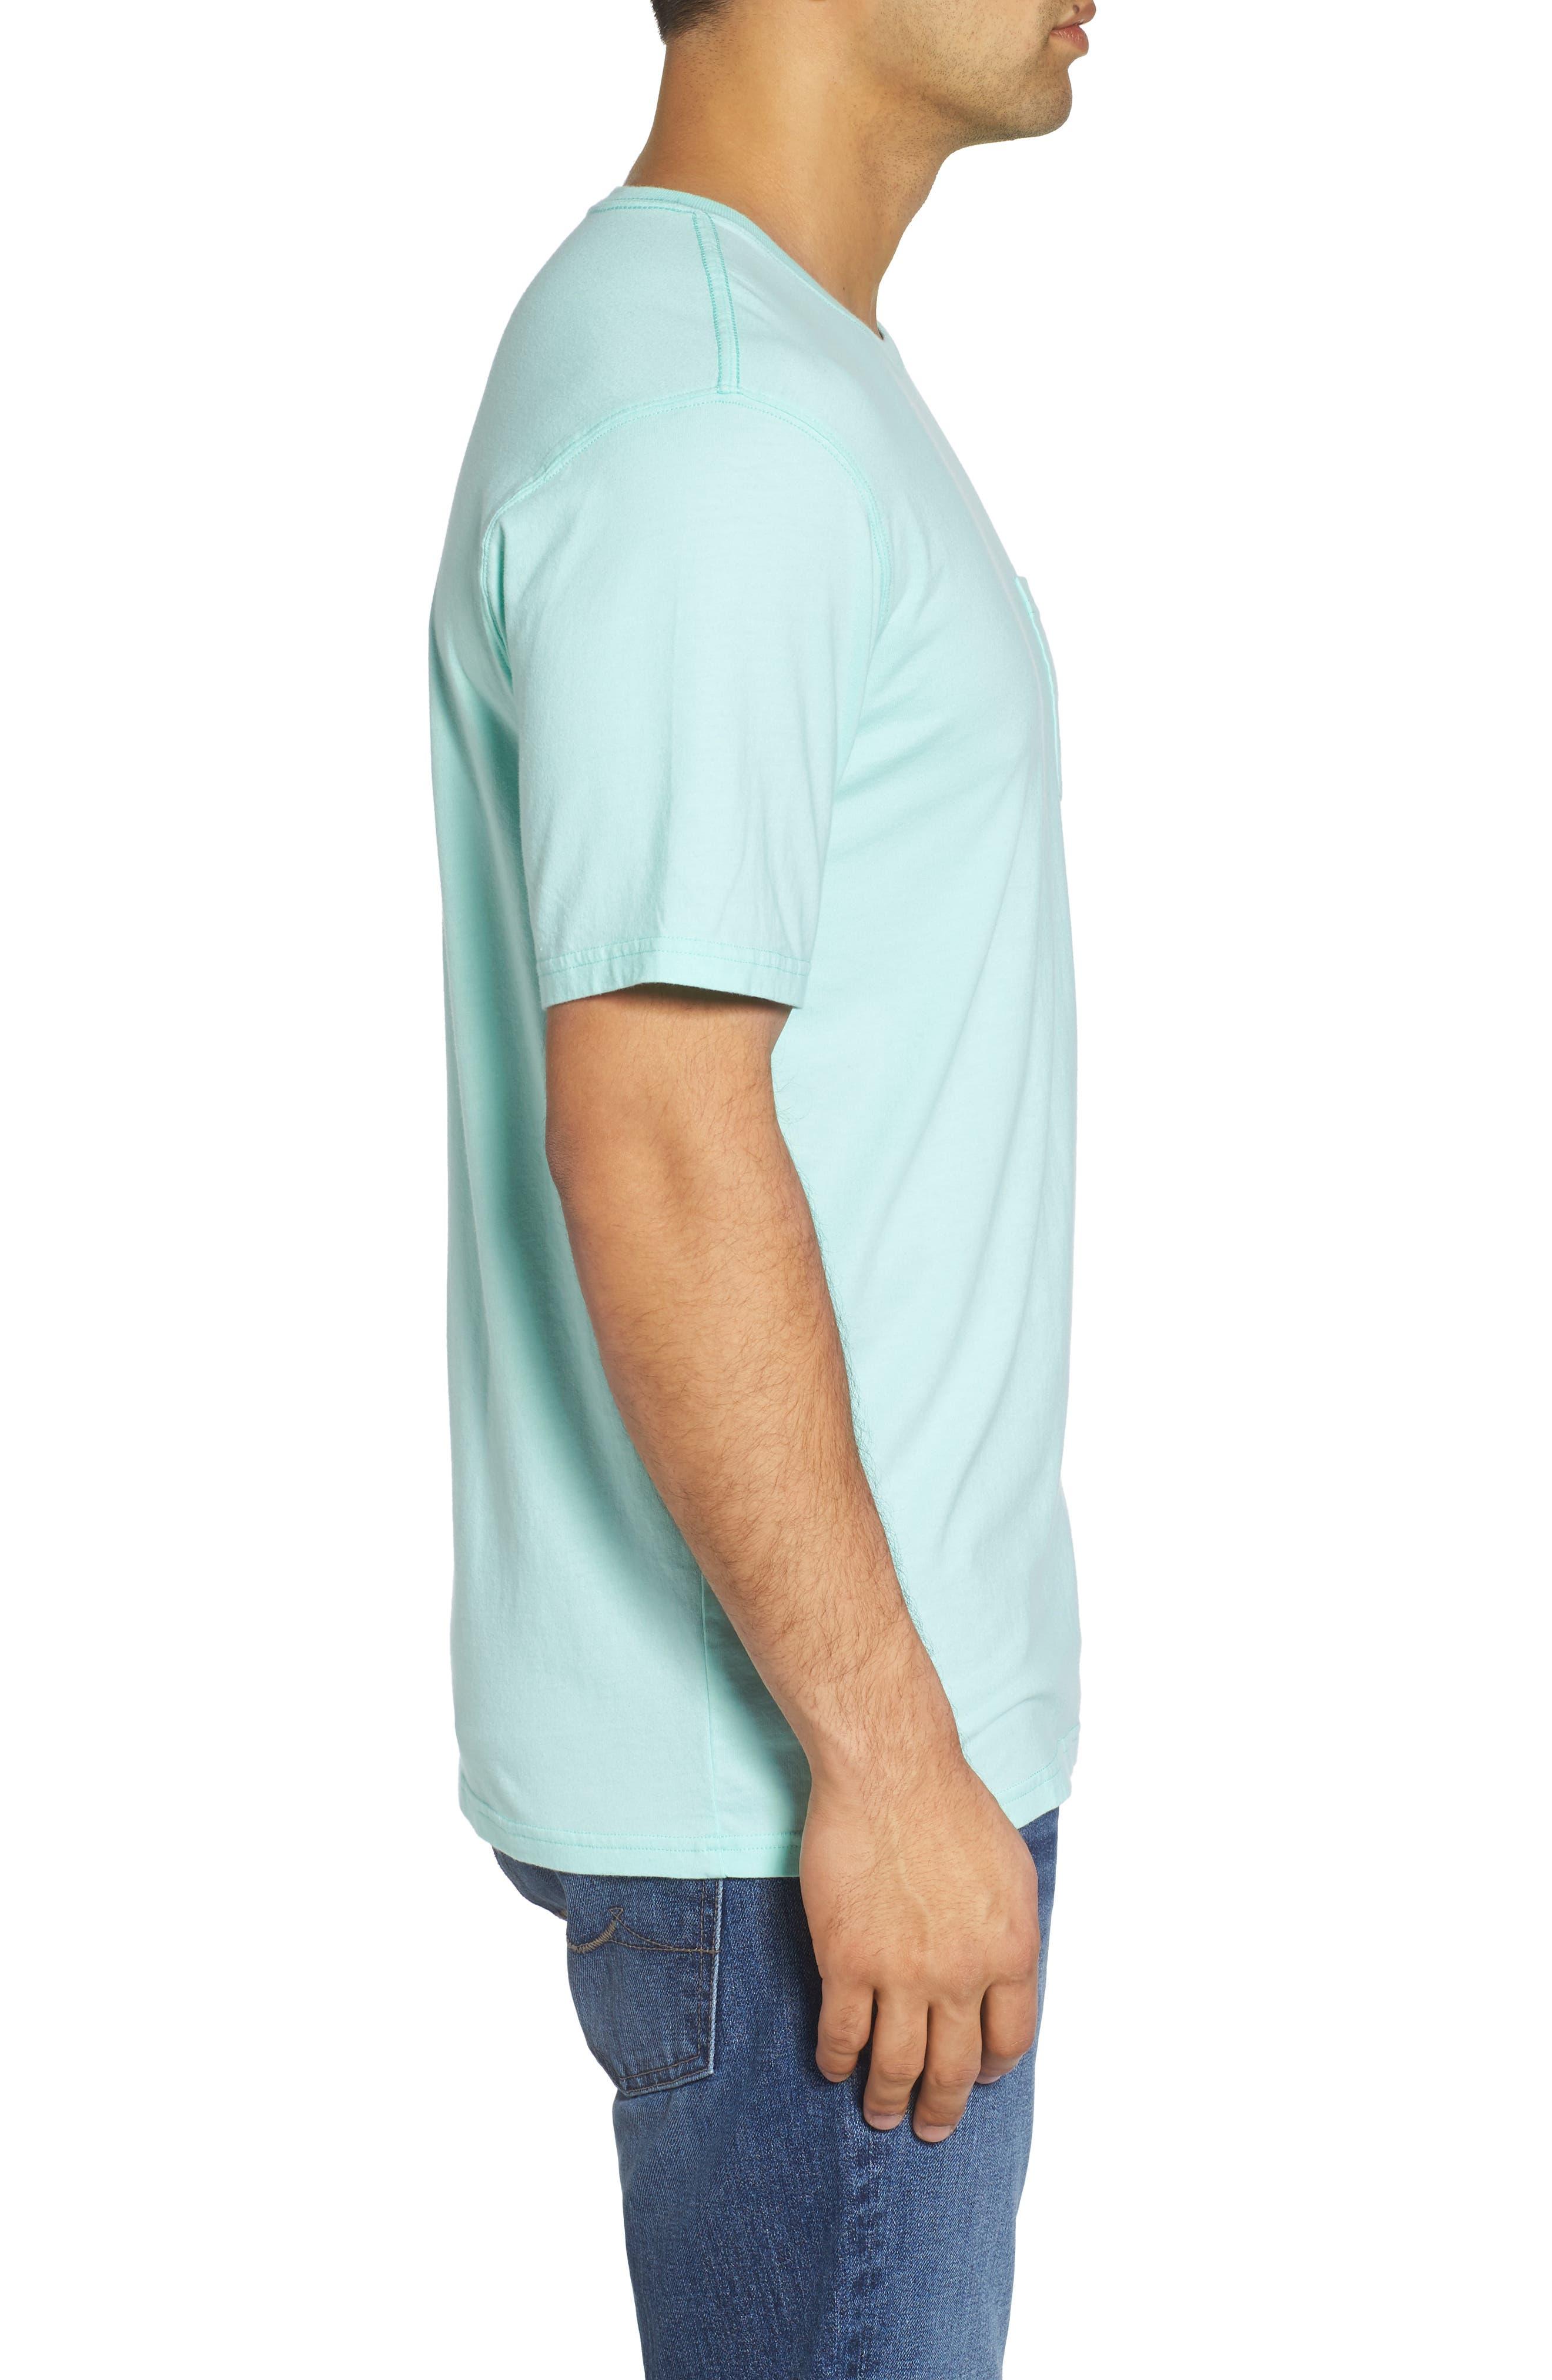 Southern Mix Crewneck T-Shirt,                             Alternate thumbnail 3, color,                             376